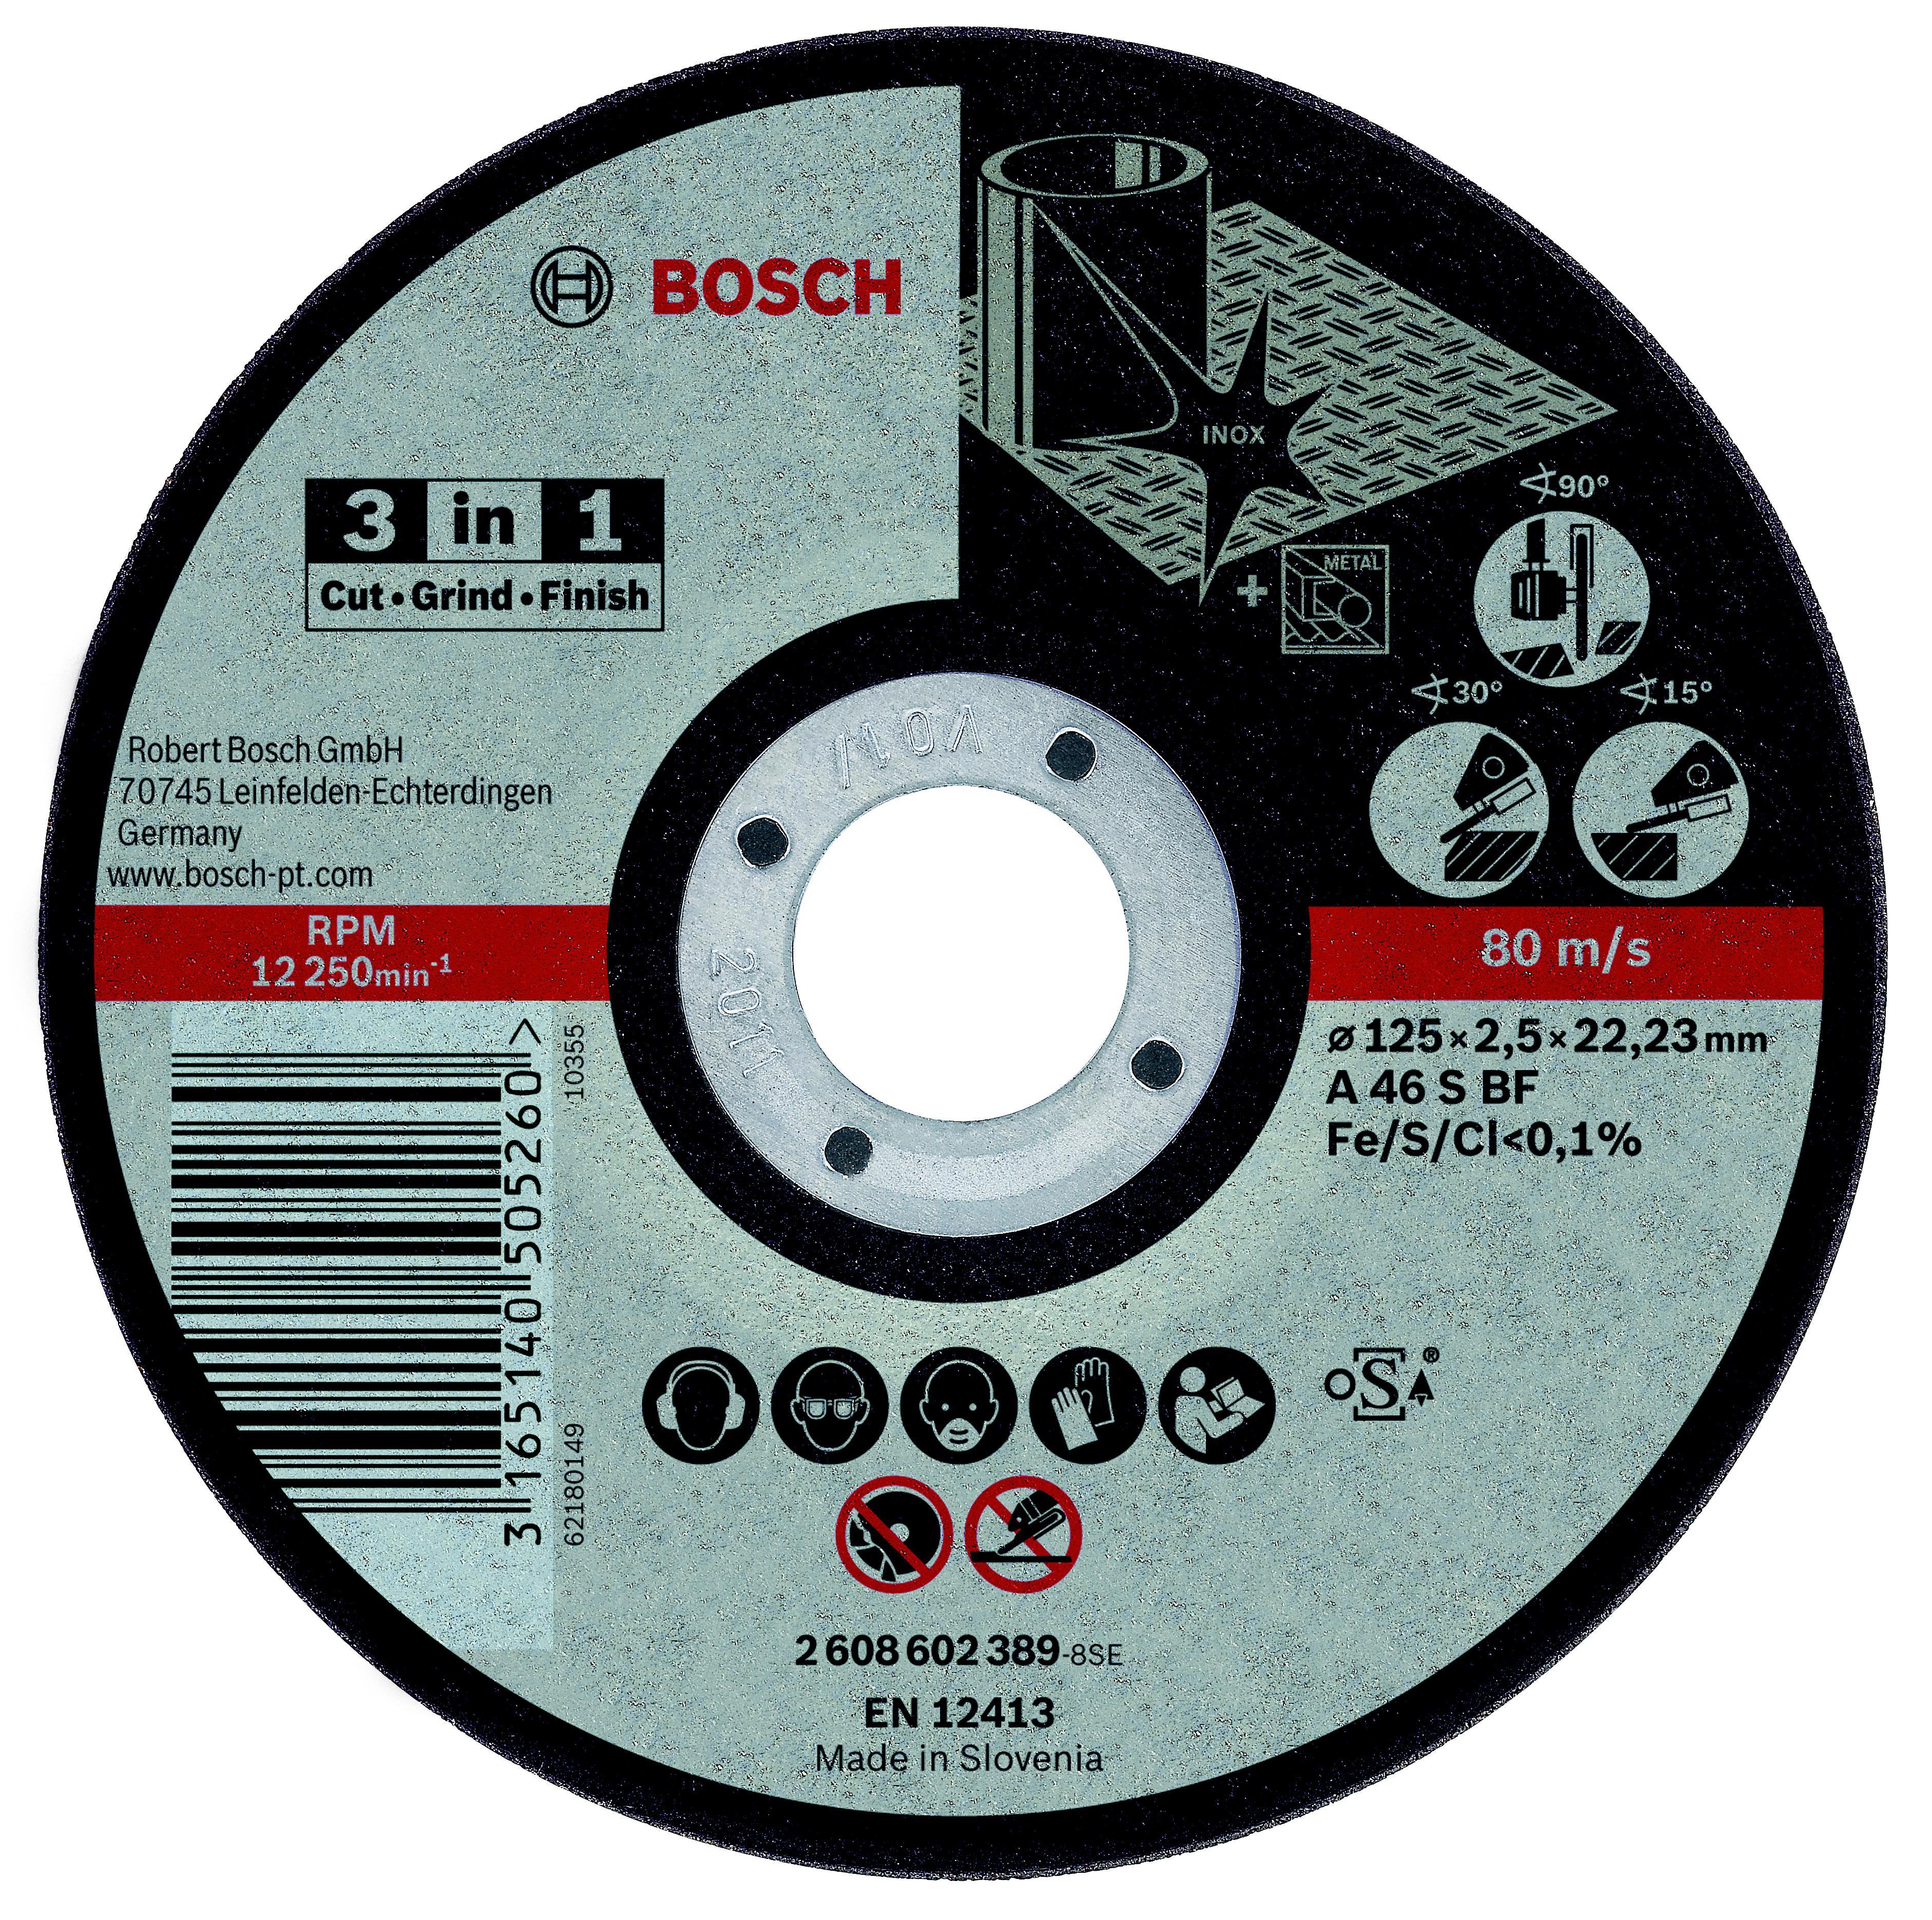 Круг отрезной Bosch 125х2.5х22 bosch 3 in 1 (2.608.602.389) круг отрезной bosch bosch 3 in 1 115x2 5x22 по нерж 2 608 602 388